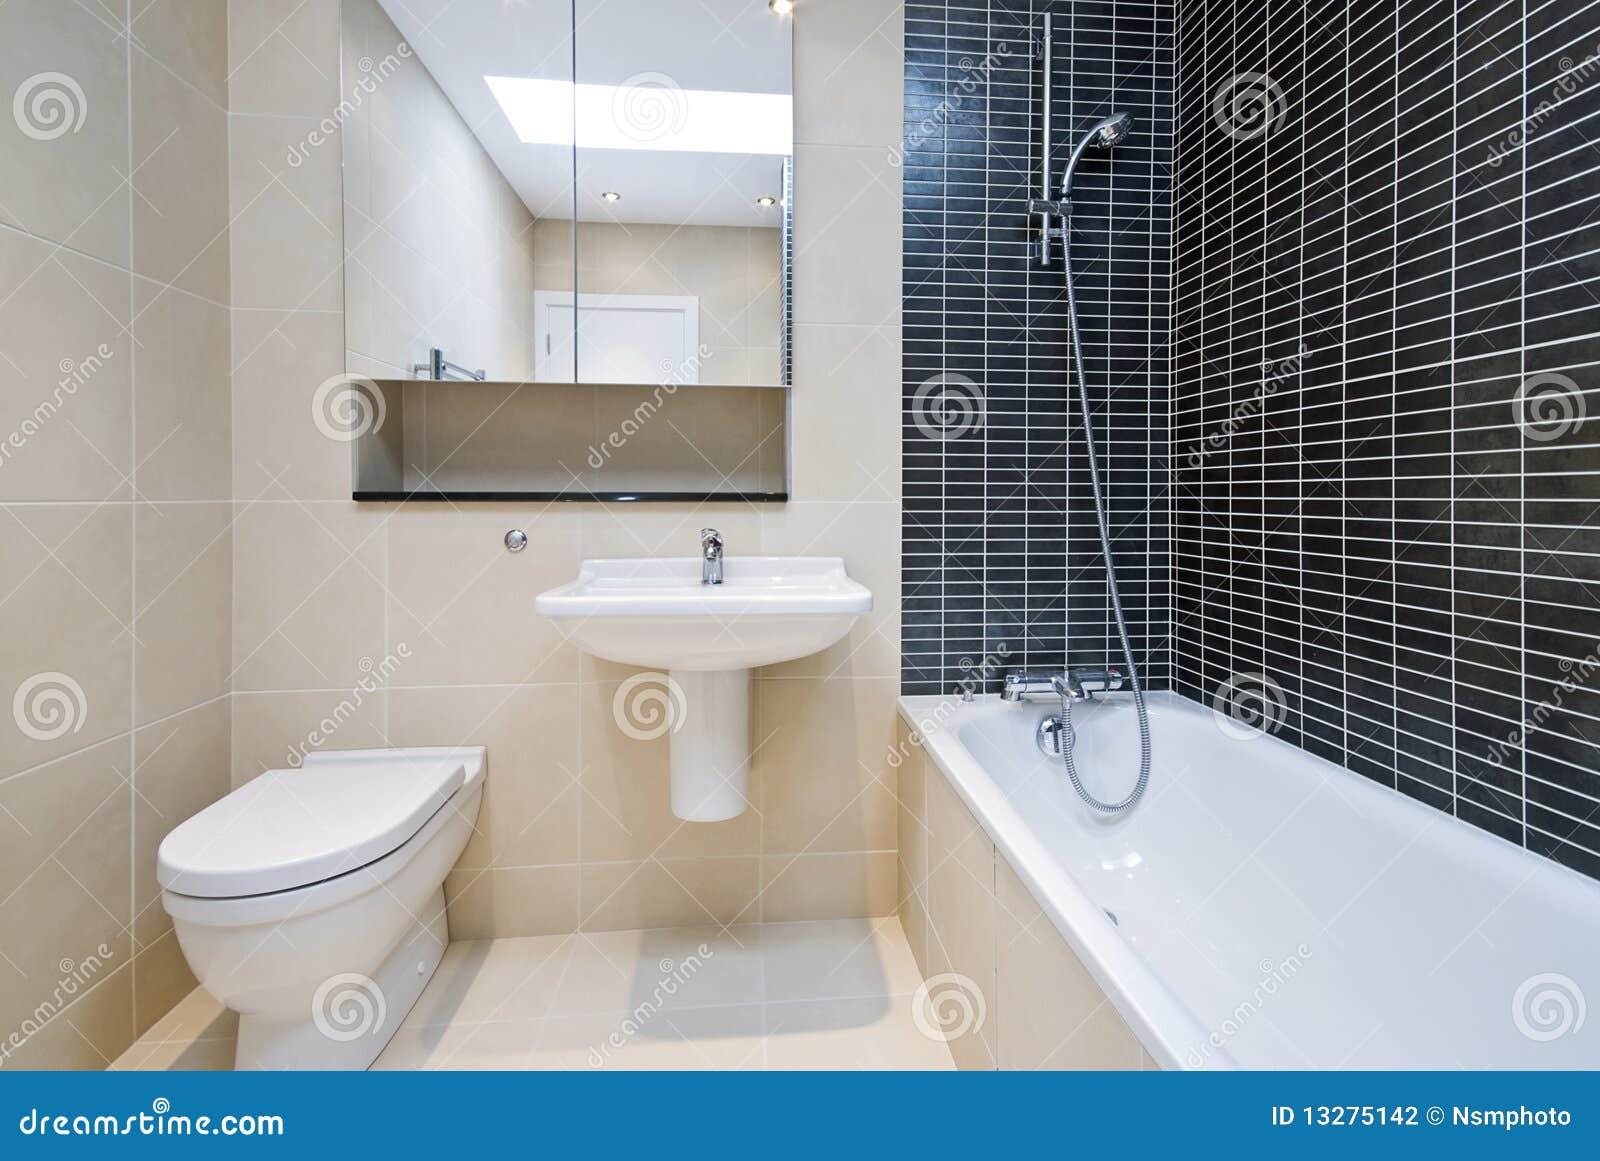 Moderne Engels reeksbadkamers In Beige Met Zwarte Tegels Stock Fotografie   Afbeelding  13275142